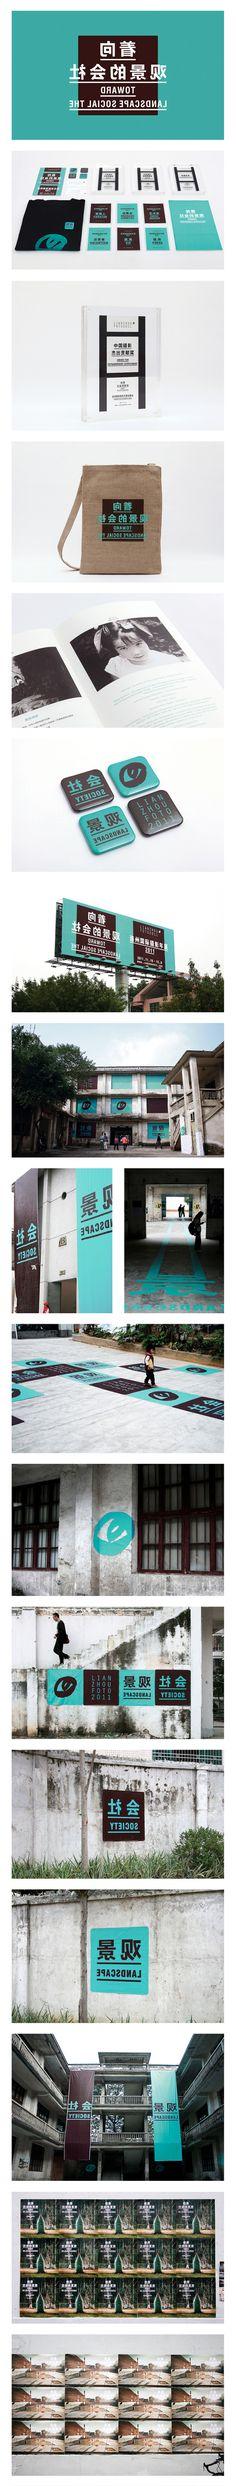 LIAN ZHOU FOTO 2011 by peiyuan chen, via Behance Corporate Identity Design, Brand Identity Design, Business Branding, Logo Branding, Branding Design, Logos, Chinese Design, Web Design, Graphic Design